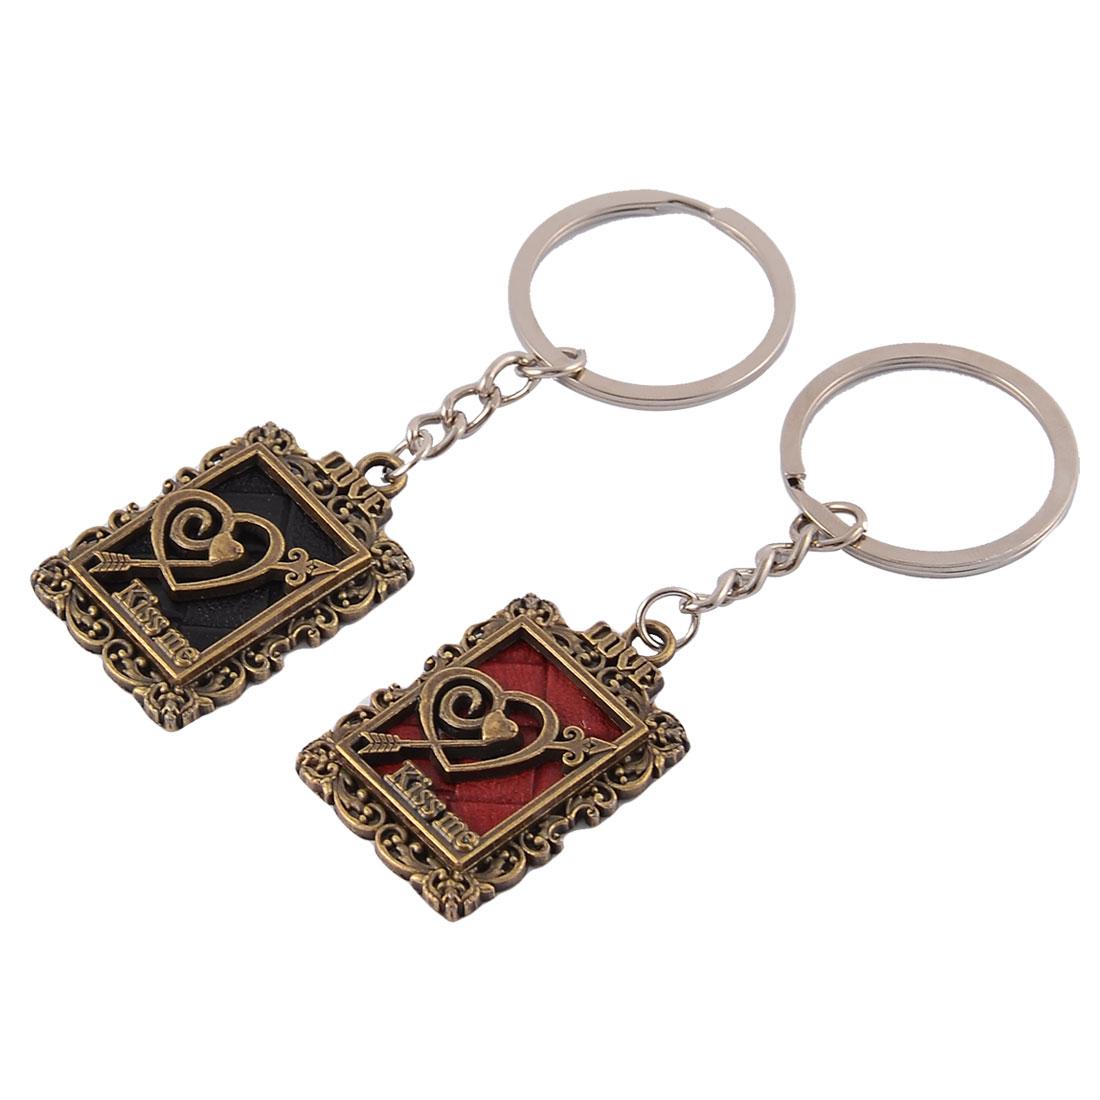 Lovers Pendants Ornament Keychain Key Rings Hanging Decor Keyring 2pcs